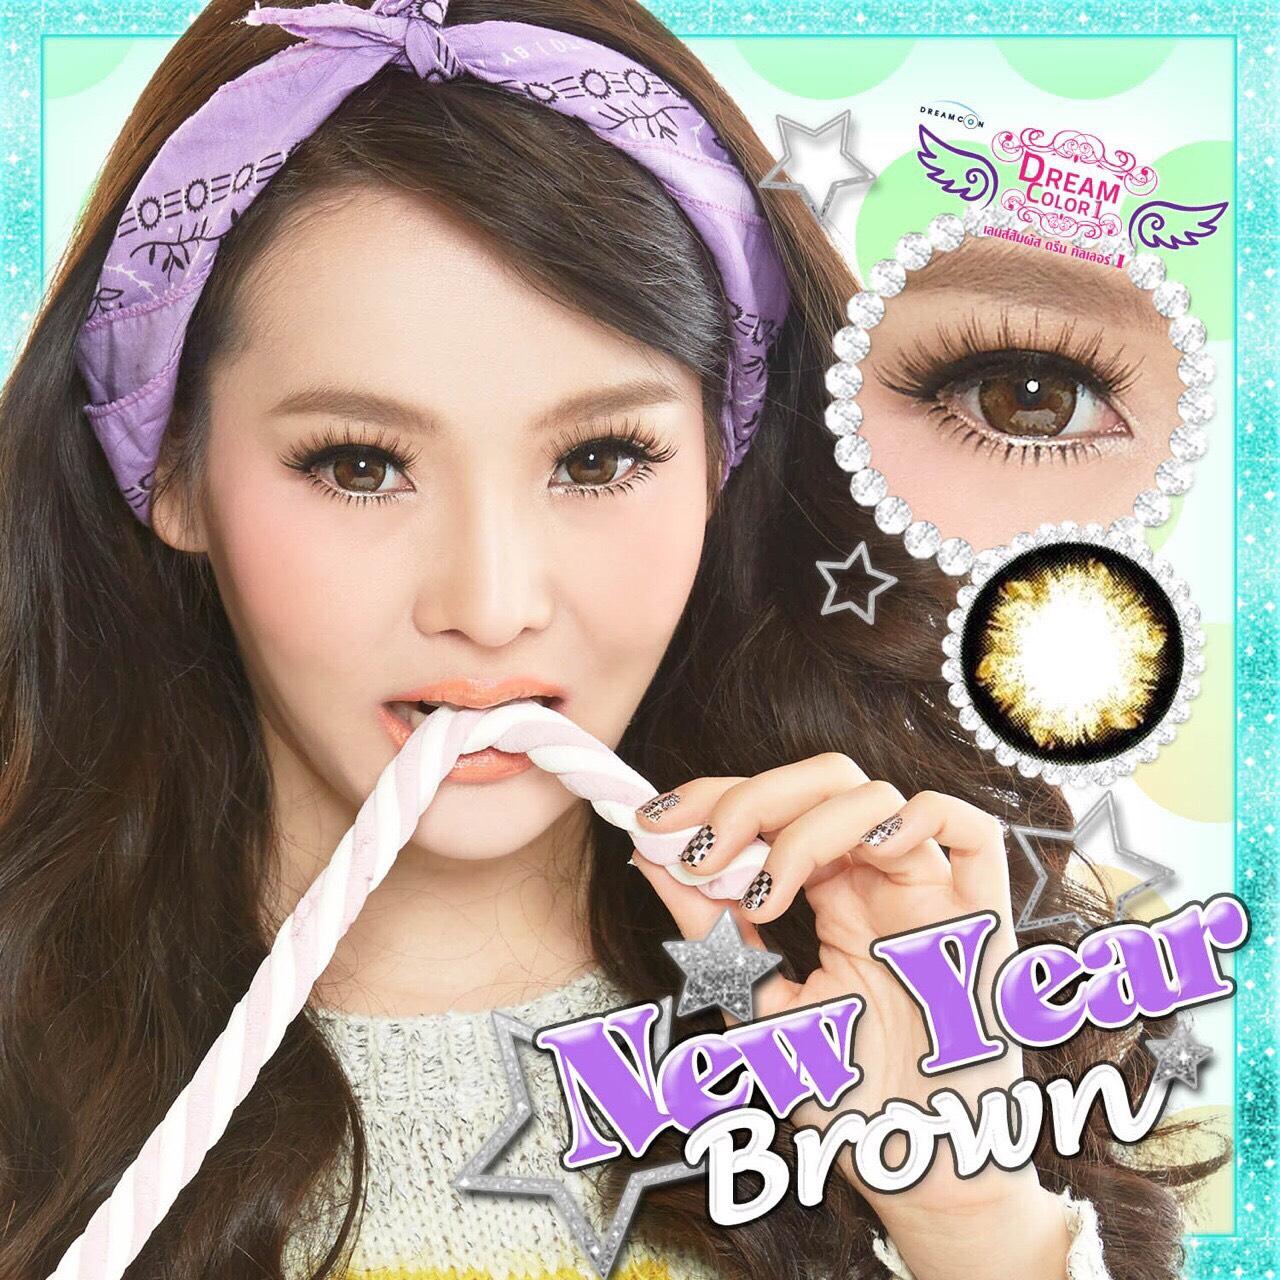 New Year Brown Dreamcolor1เลนส์นิ่มใส่สบาย คอนแทคเลนส์ ขายส่งคอนแทคเลนส์ ขายส่งBigeye Bigeyeเกาหลี